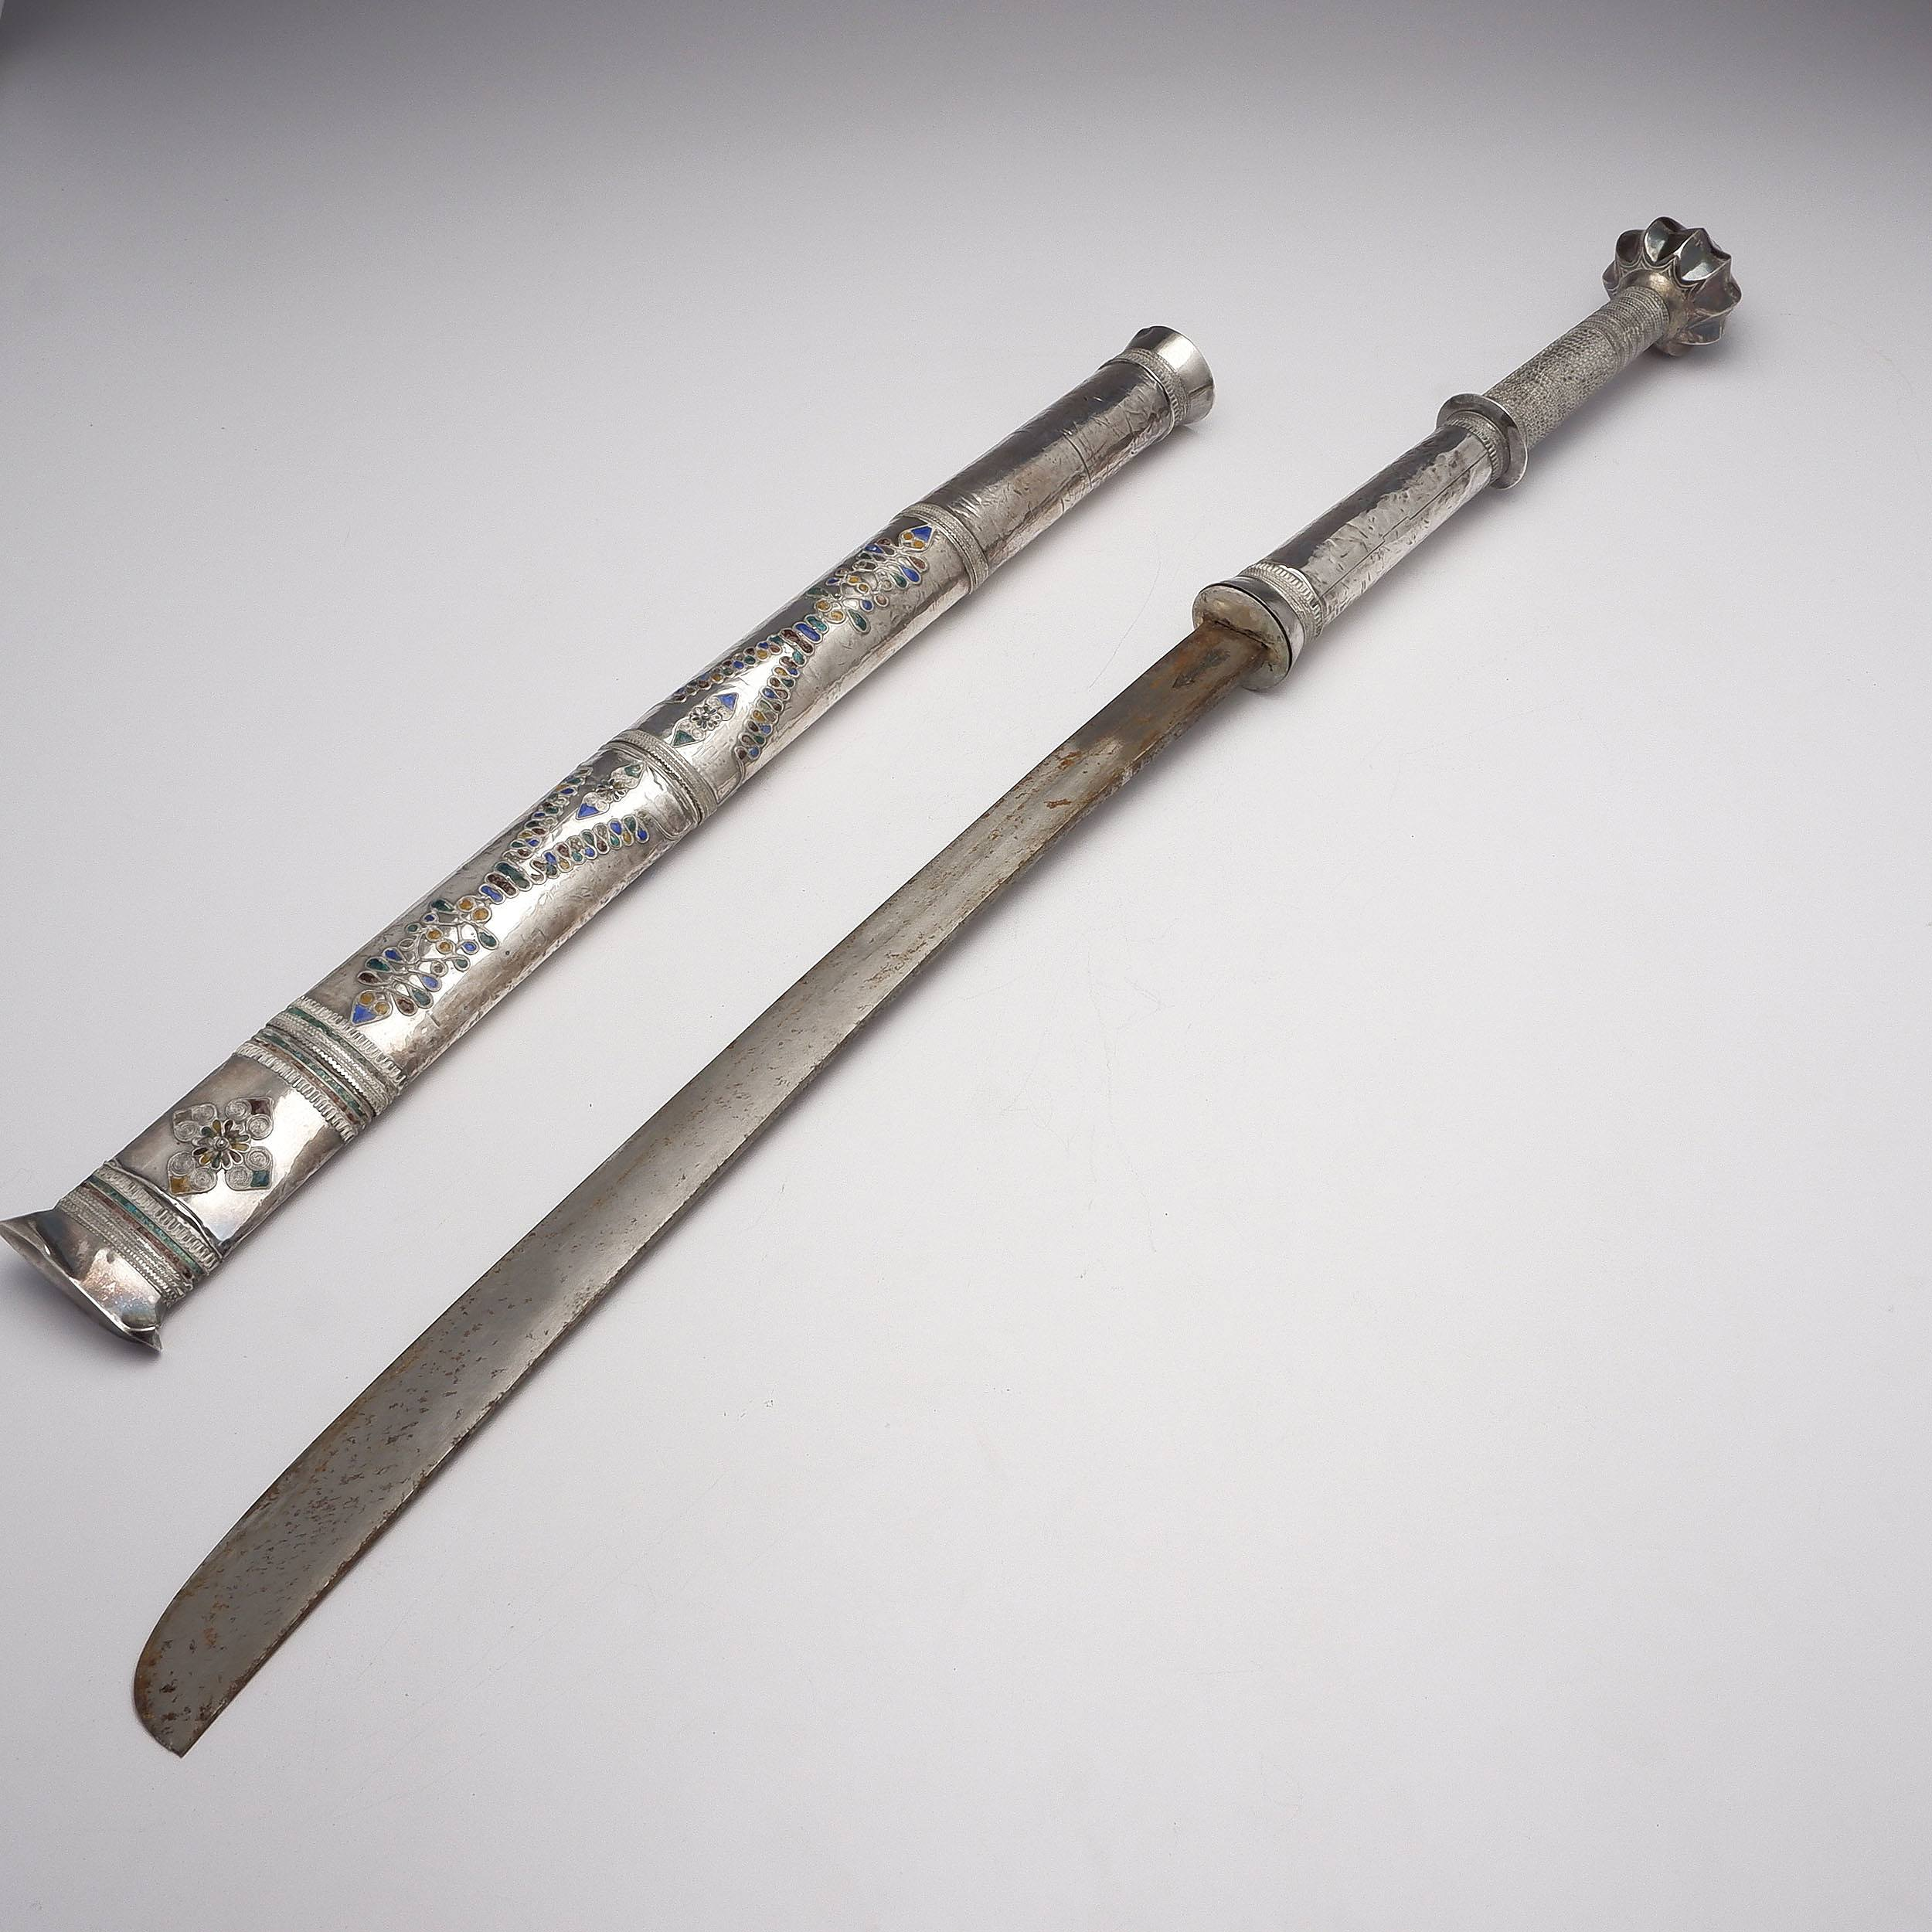 'Burmese Silver Cased Sword with Enamel Decoration'